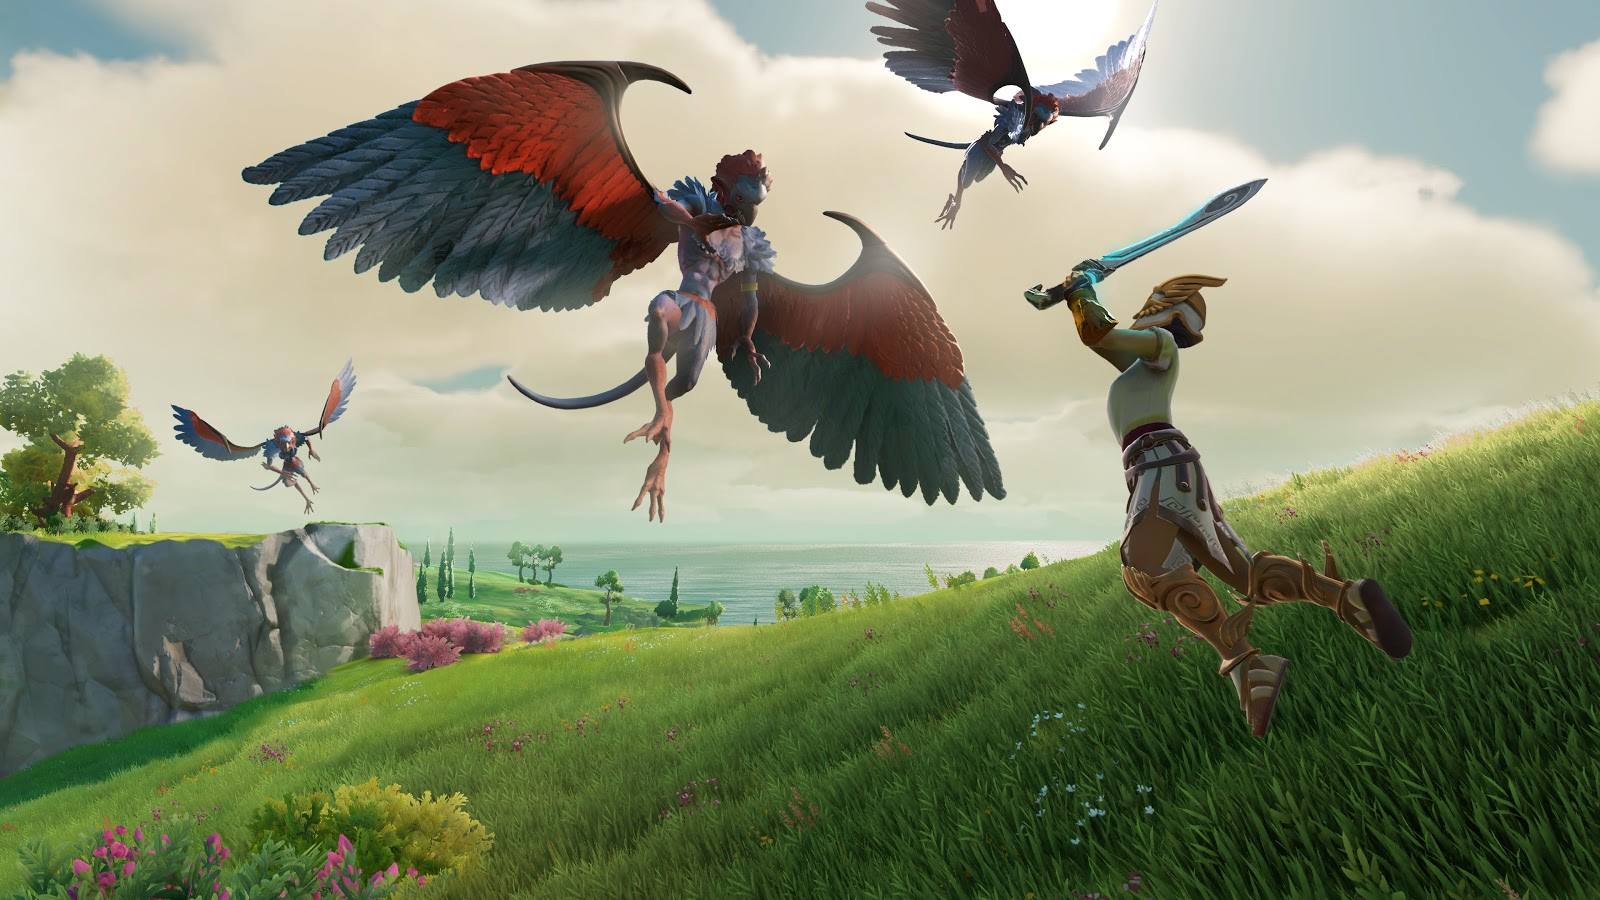 【E3 2019】《渡神纪》前瞻:并非只是「旷野之息」的简单复刻